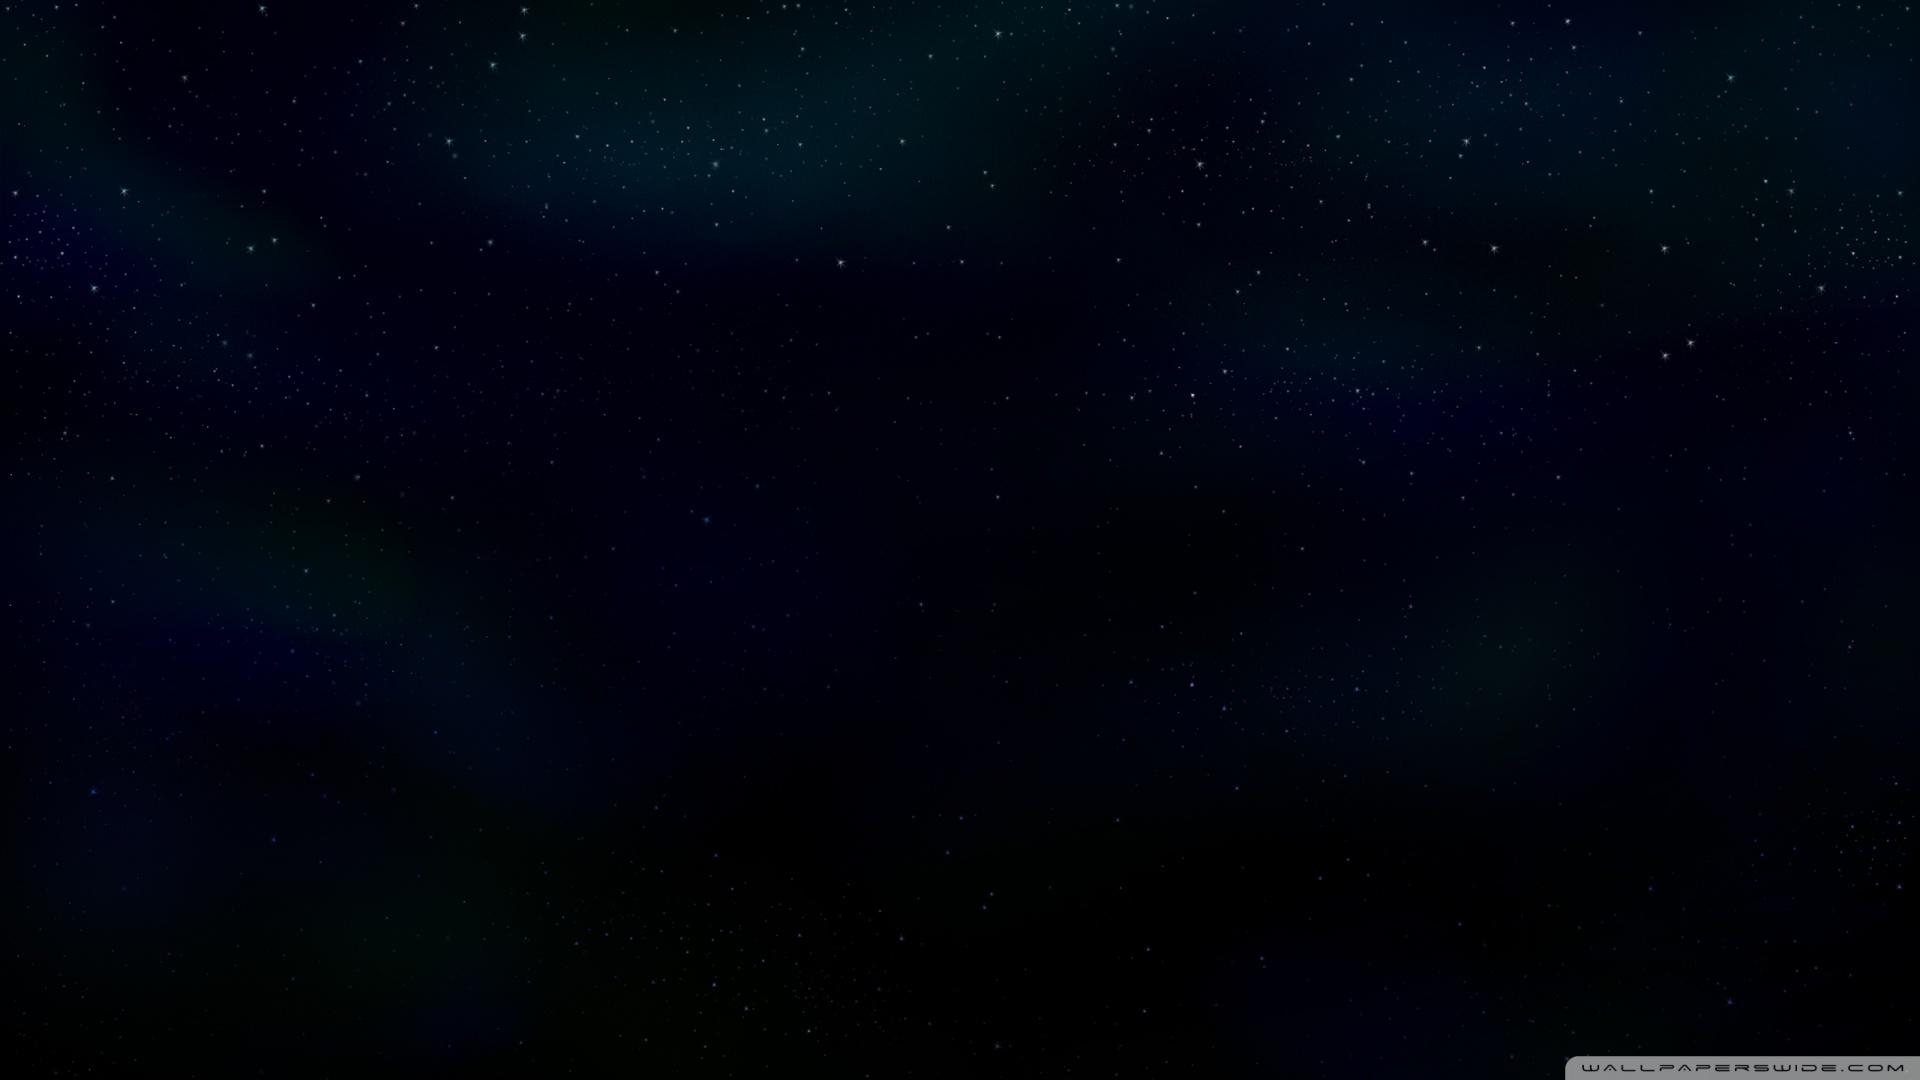 Night Sky 2 Wallpaper 1920x1080 Night Sky 2 1920x1080